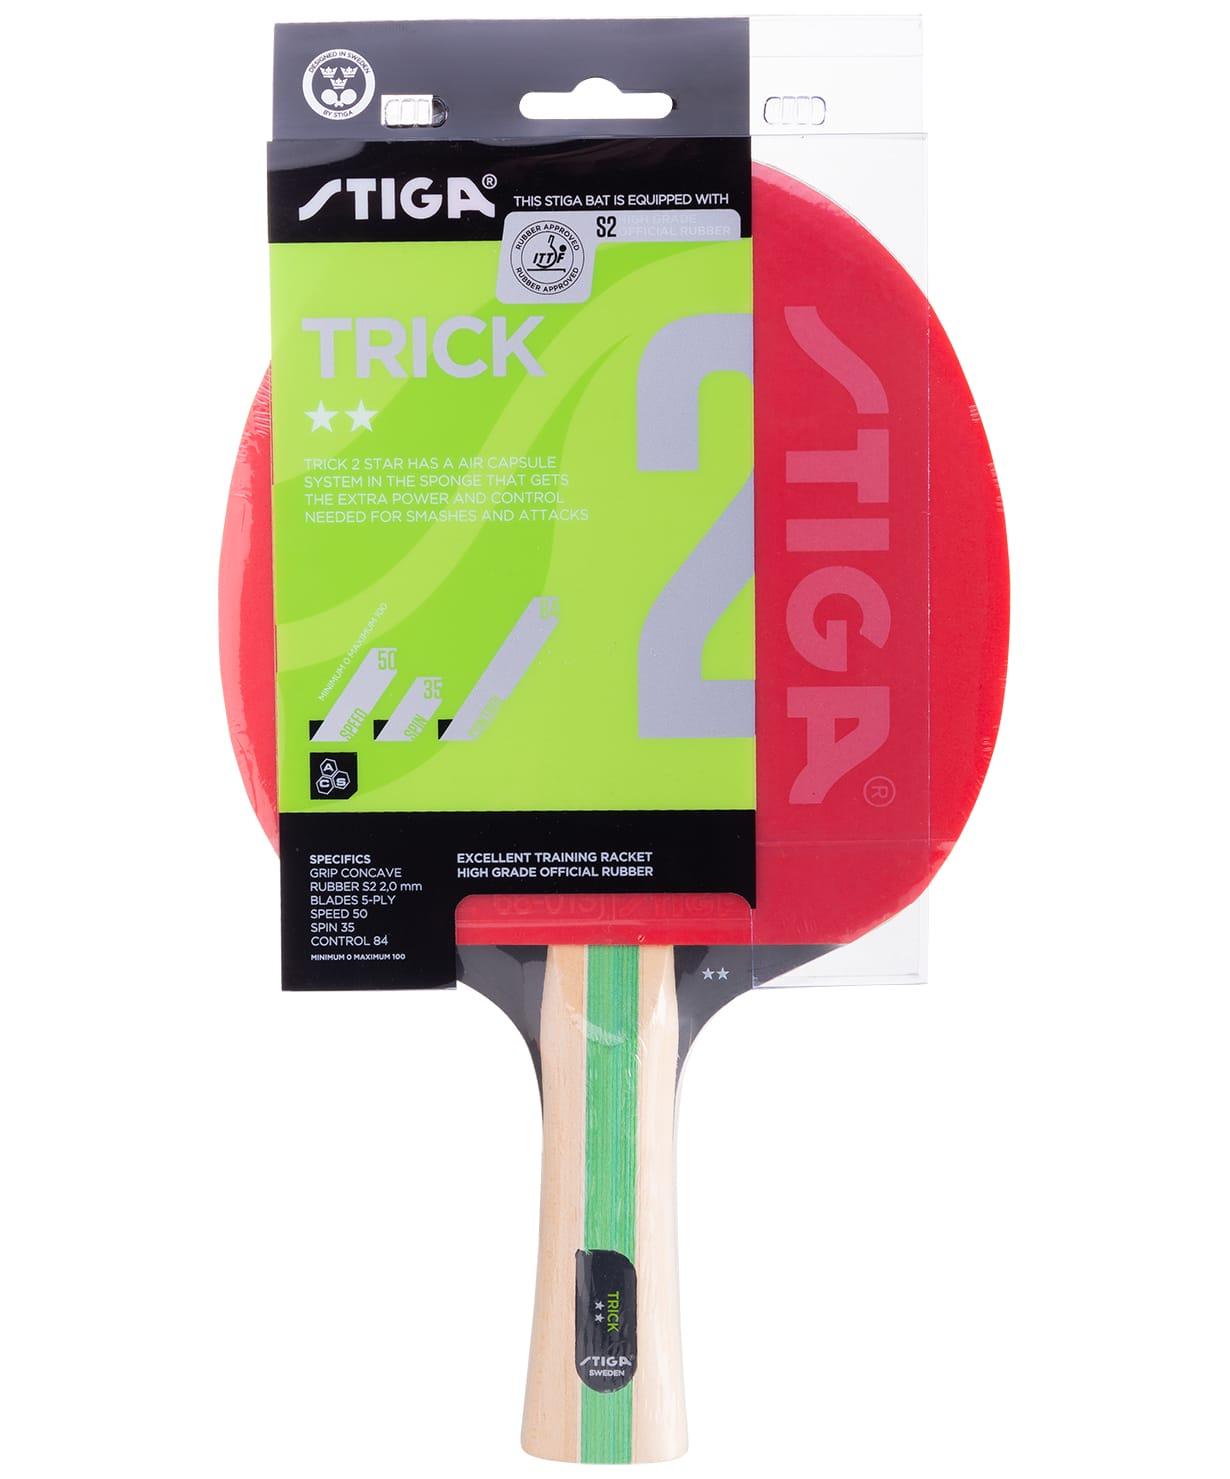 Ракетка для настольного тенниса Stiga 2 Stars Trick ACS stiga ракетка н т 2 stiga carbotech wrb ittf